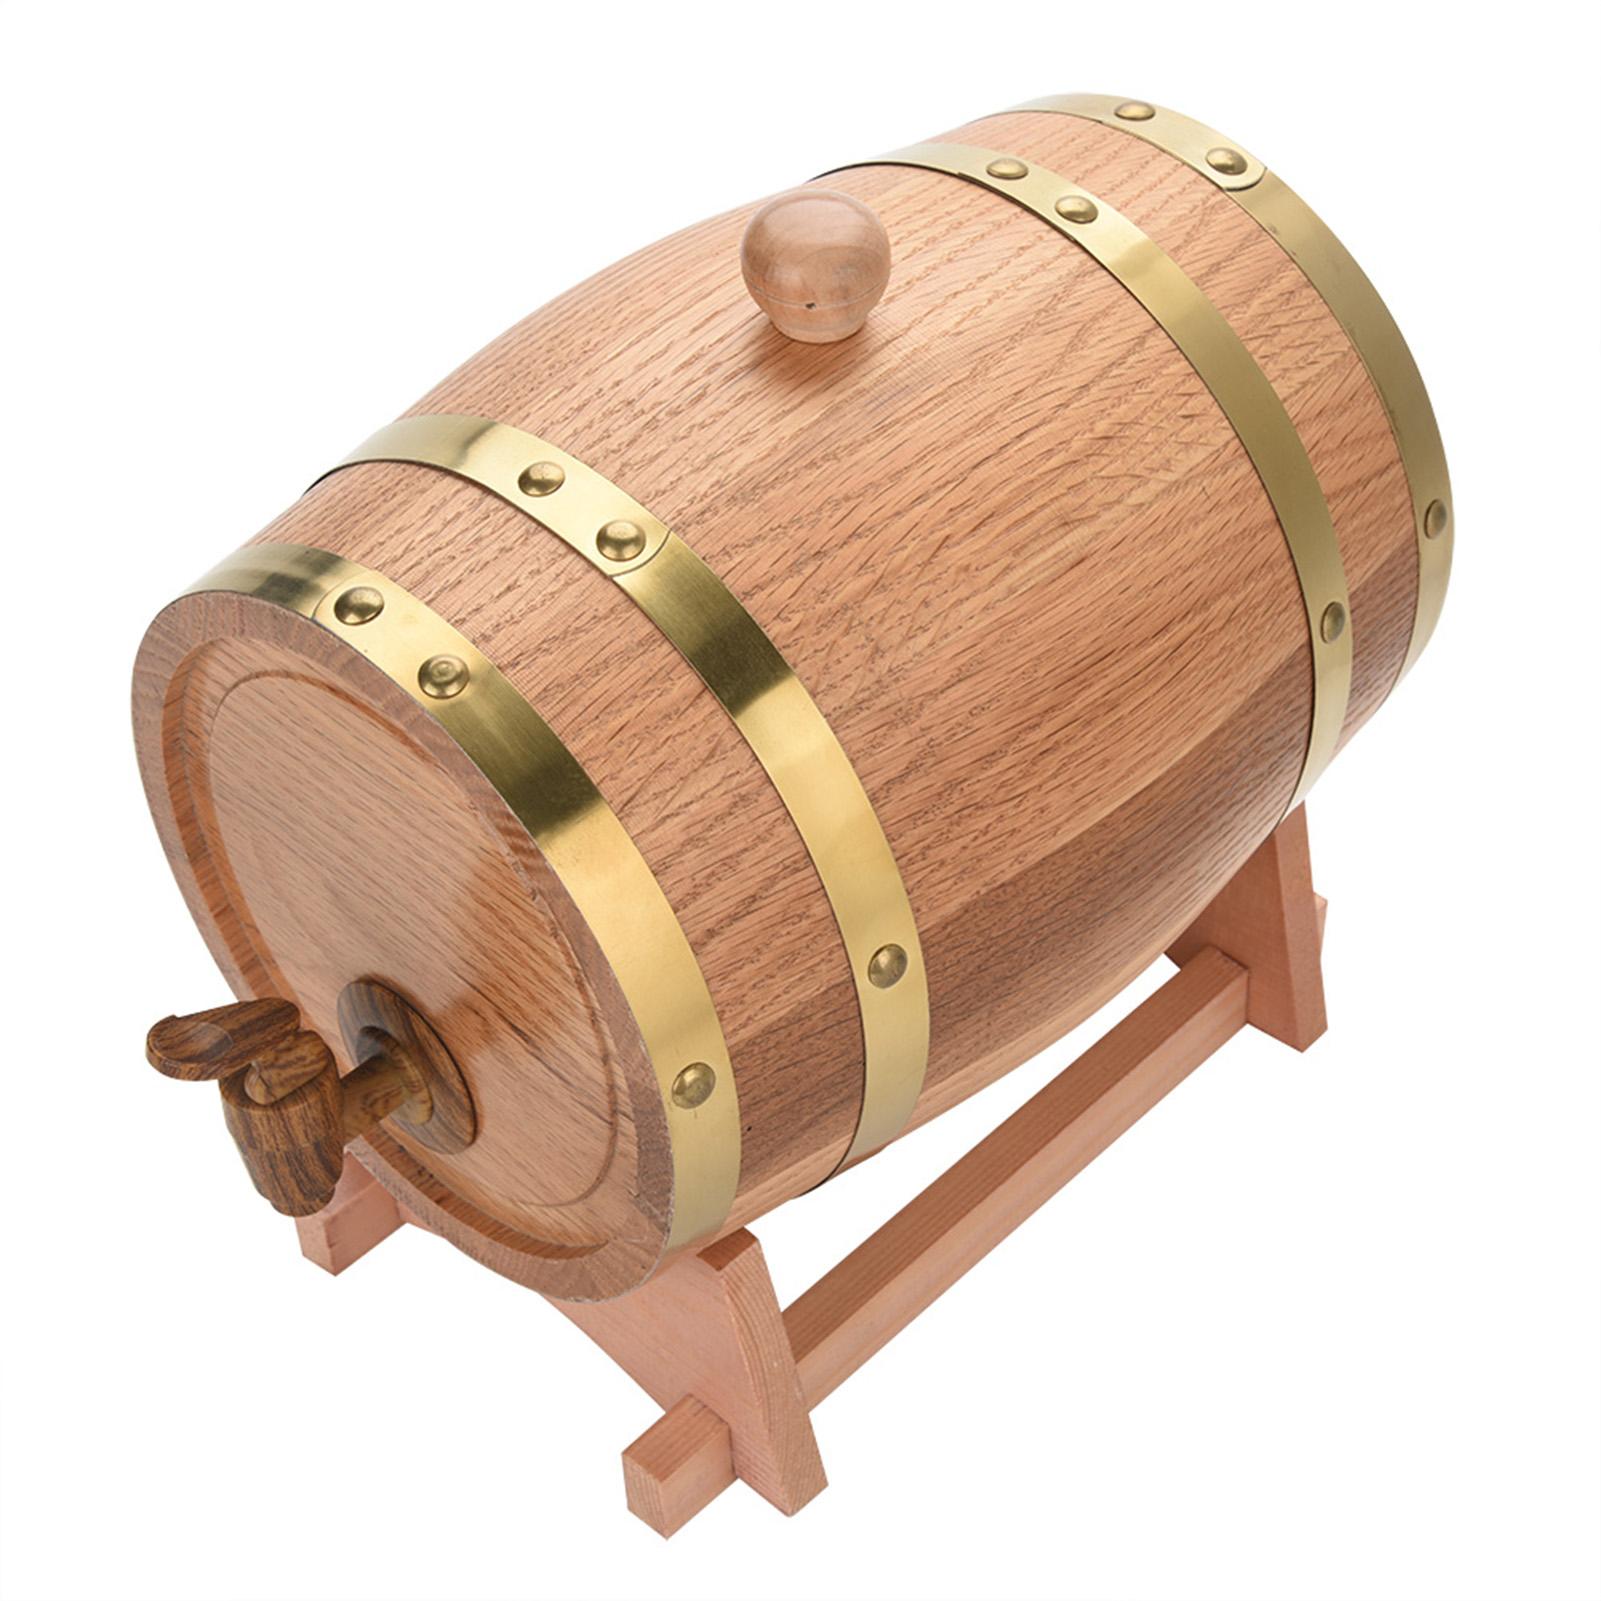 1.5//3//5//10L Eichenfass Eichenholz Weinfass Holzfass Whisky Bier Fass Regentonne